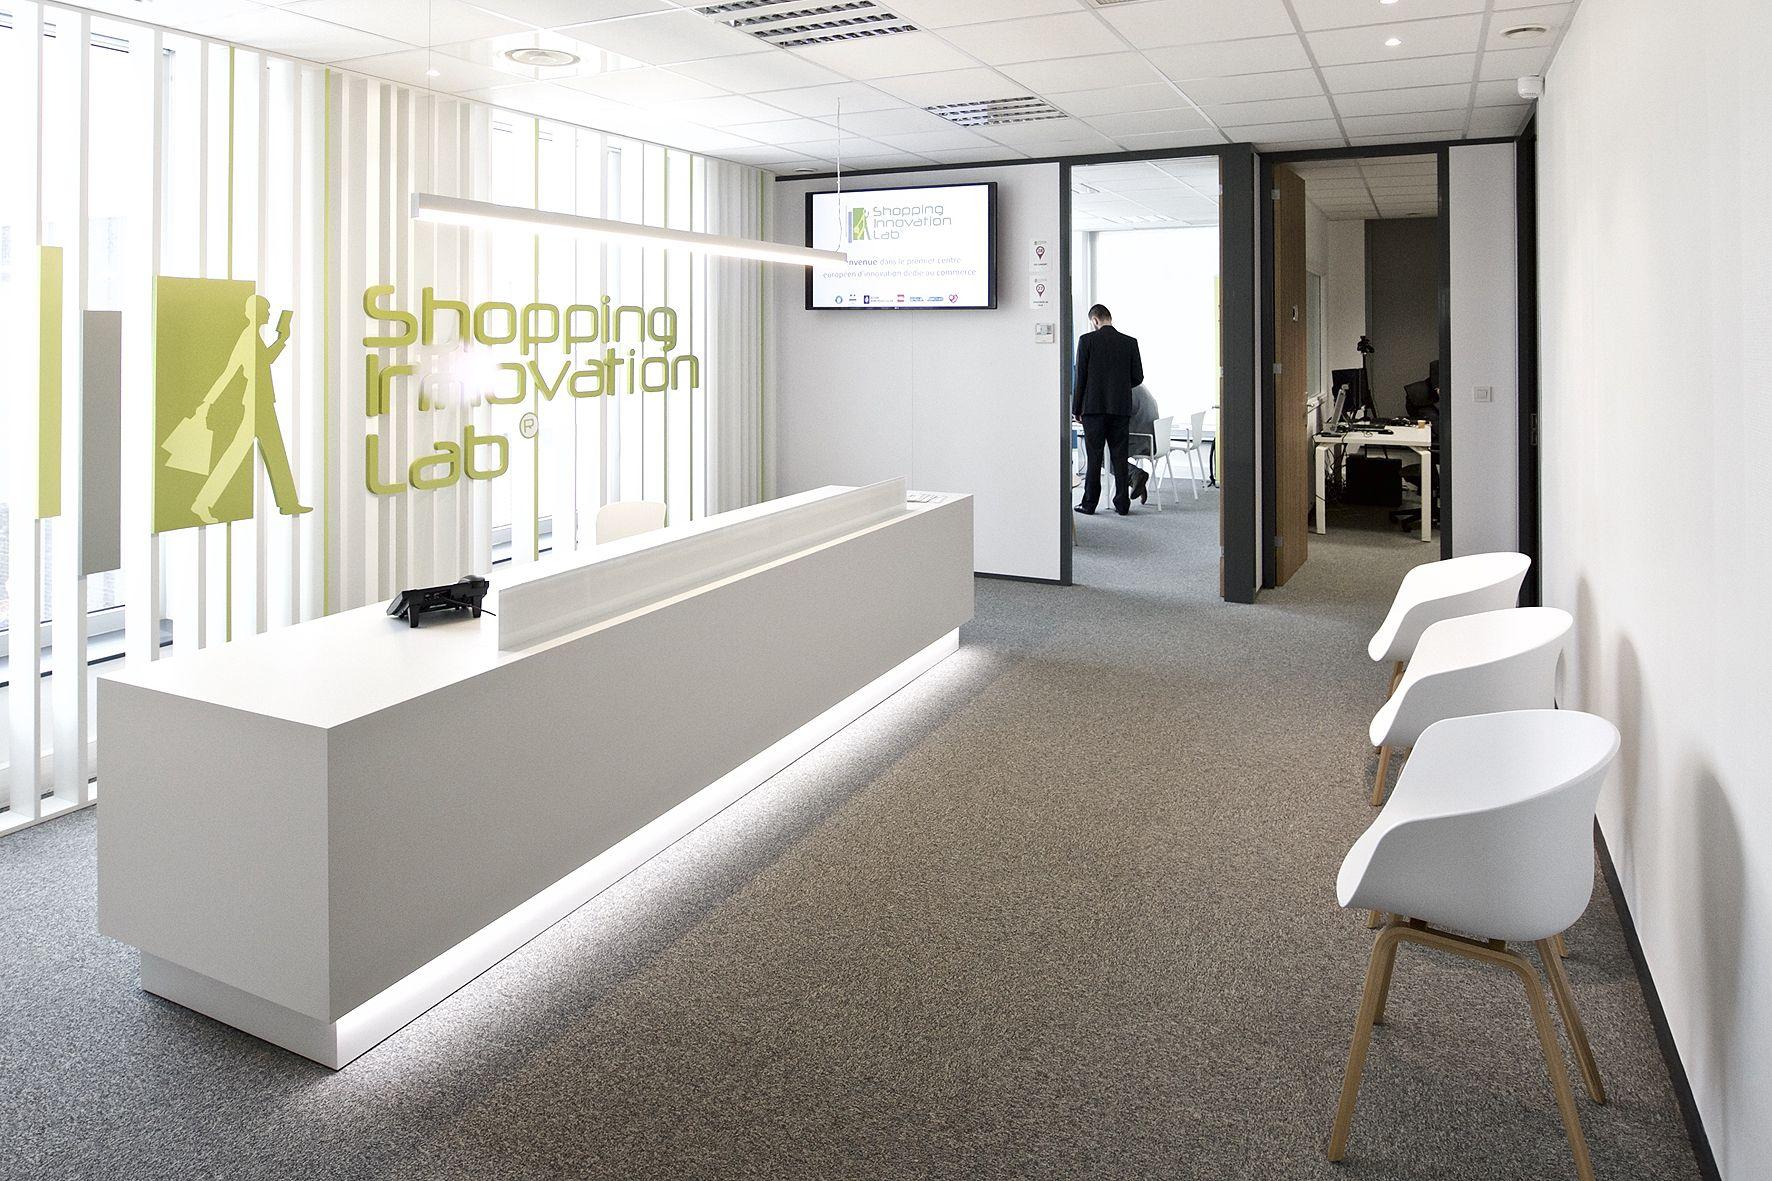 Shopping innovation lab guillaume da silva architecture t